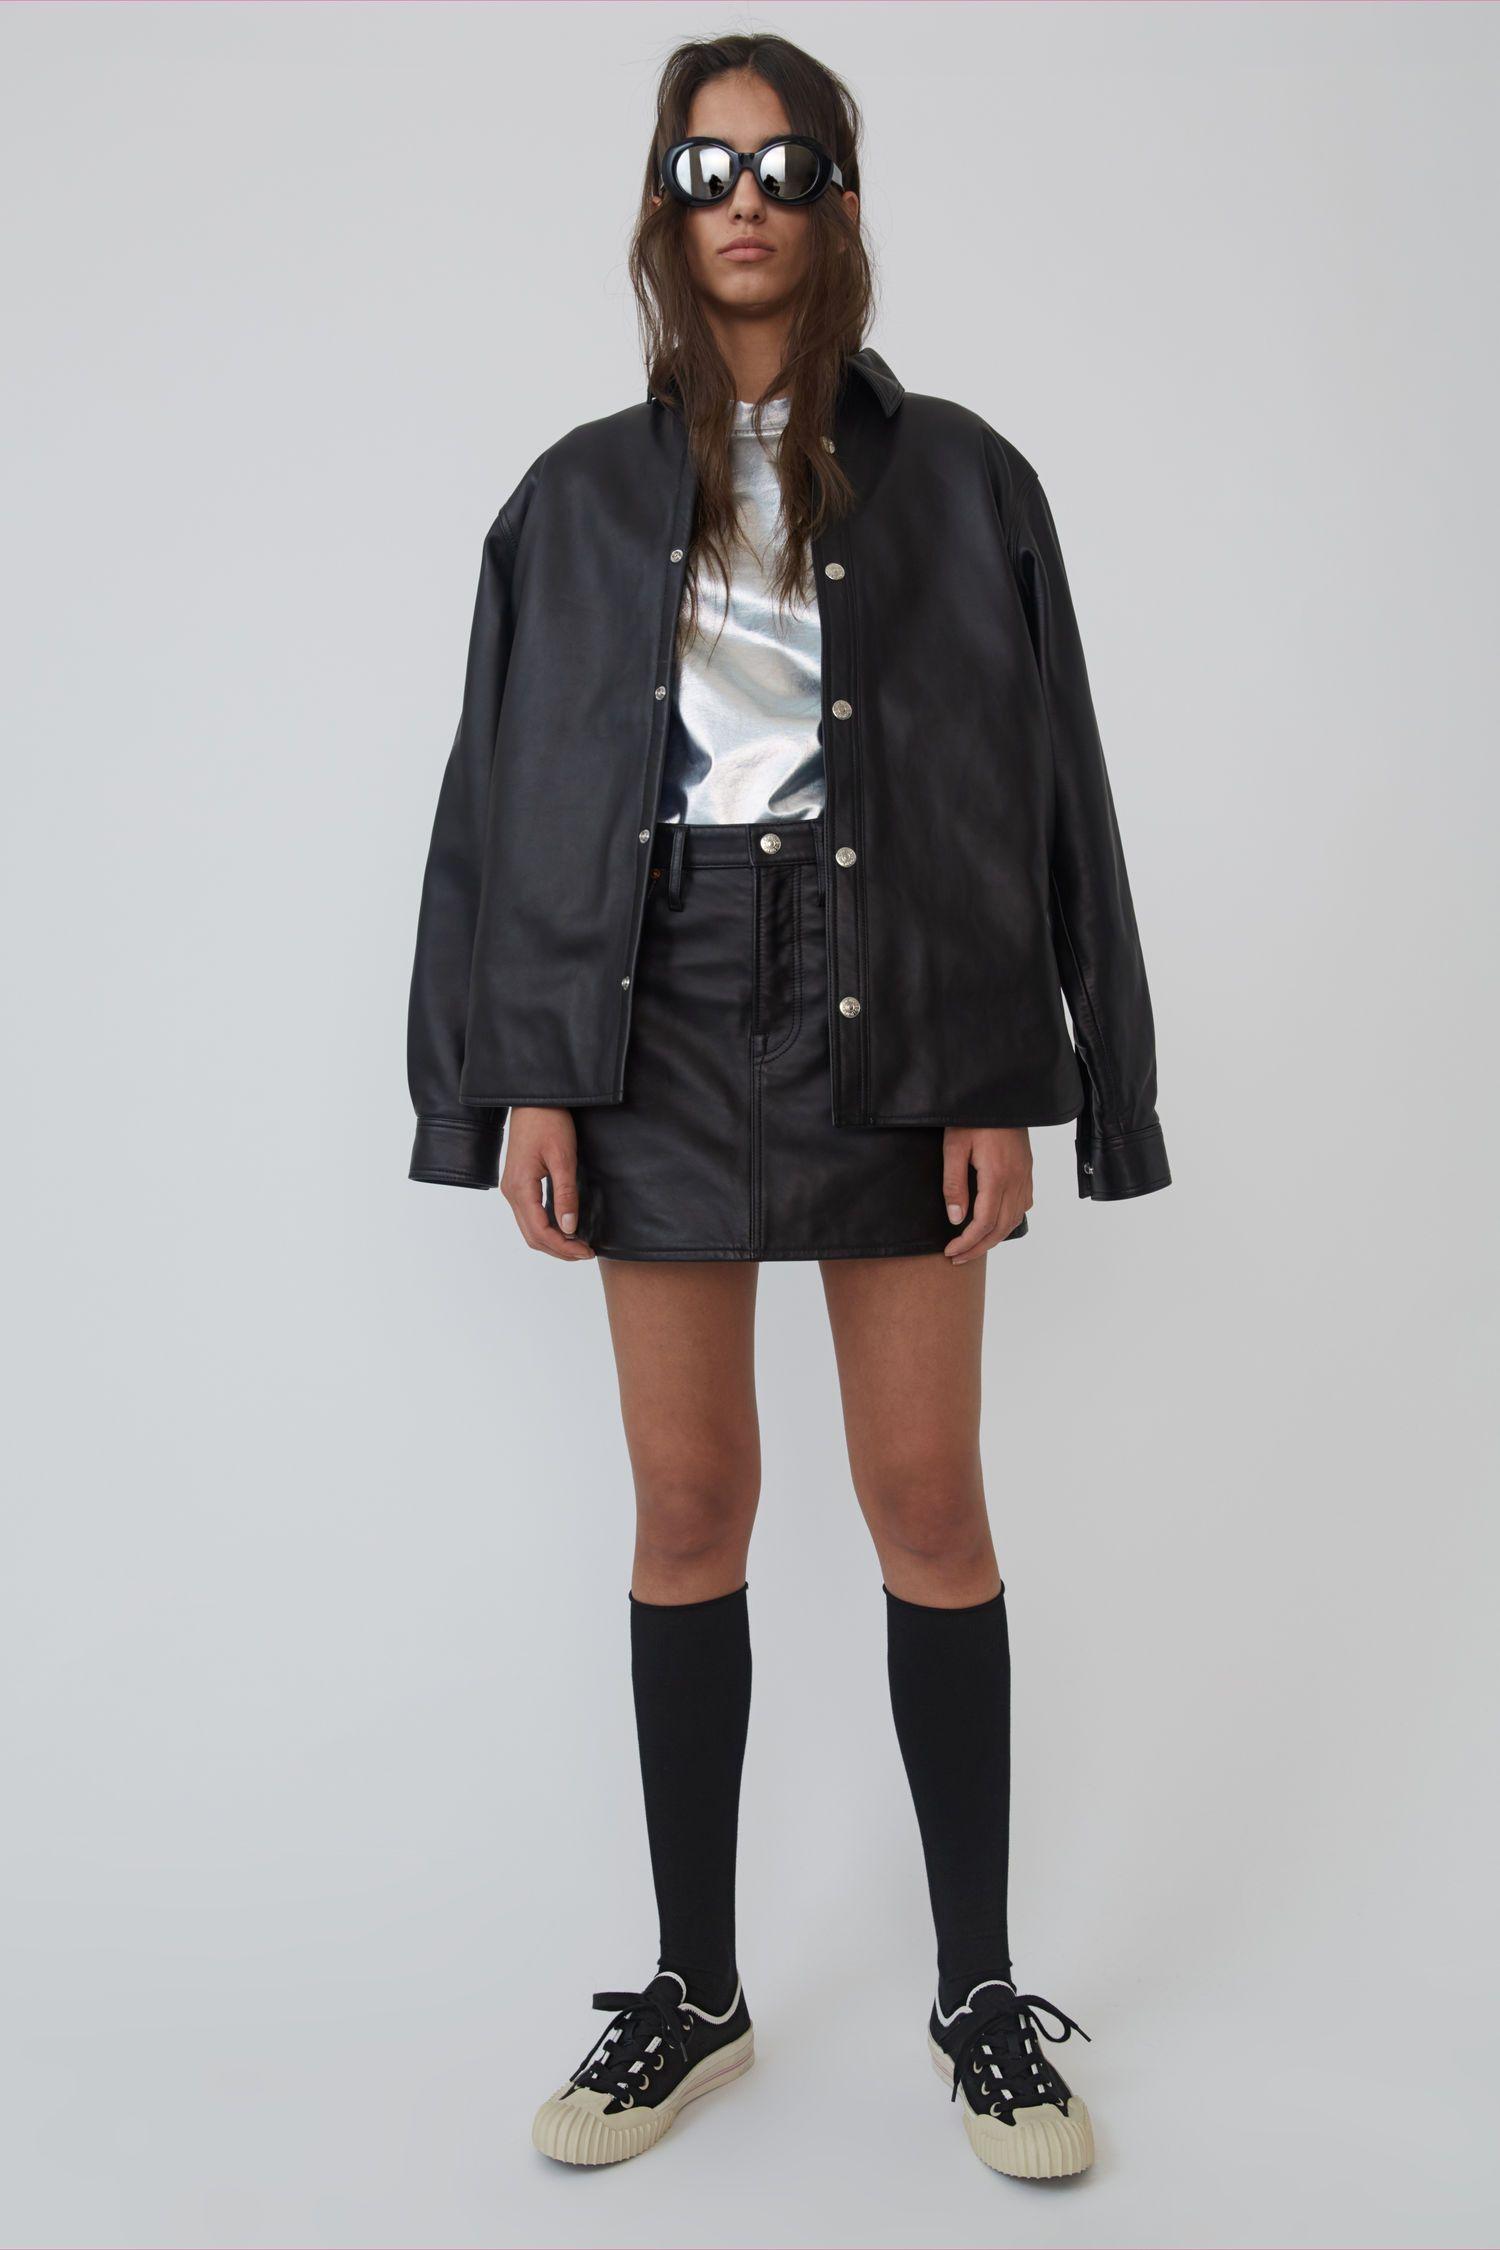 Acne Studios Leather Overshirt Black Black Well Dressed Acne Studios